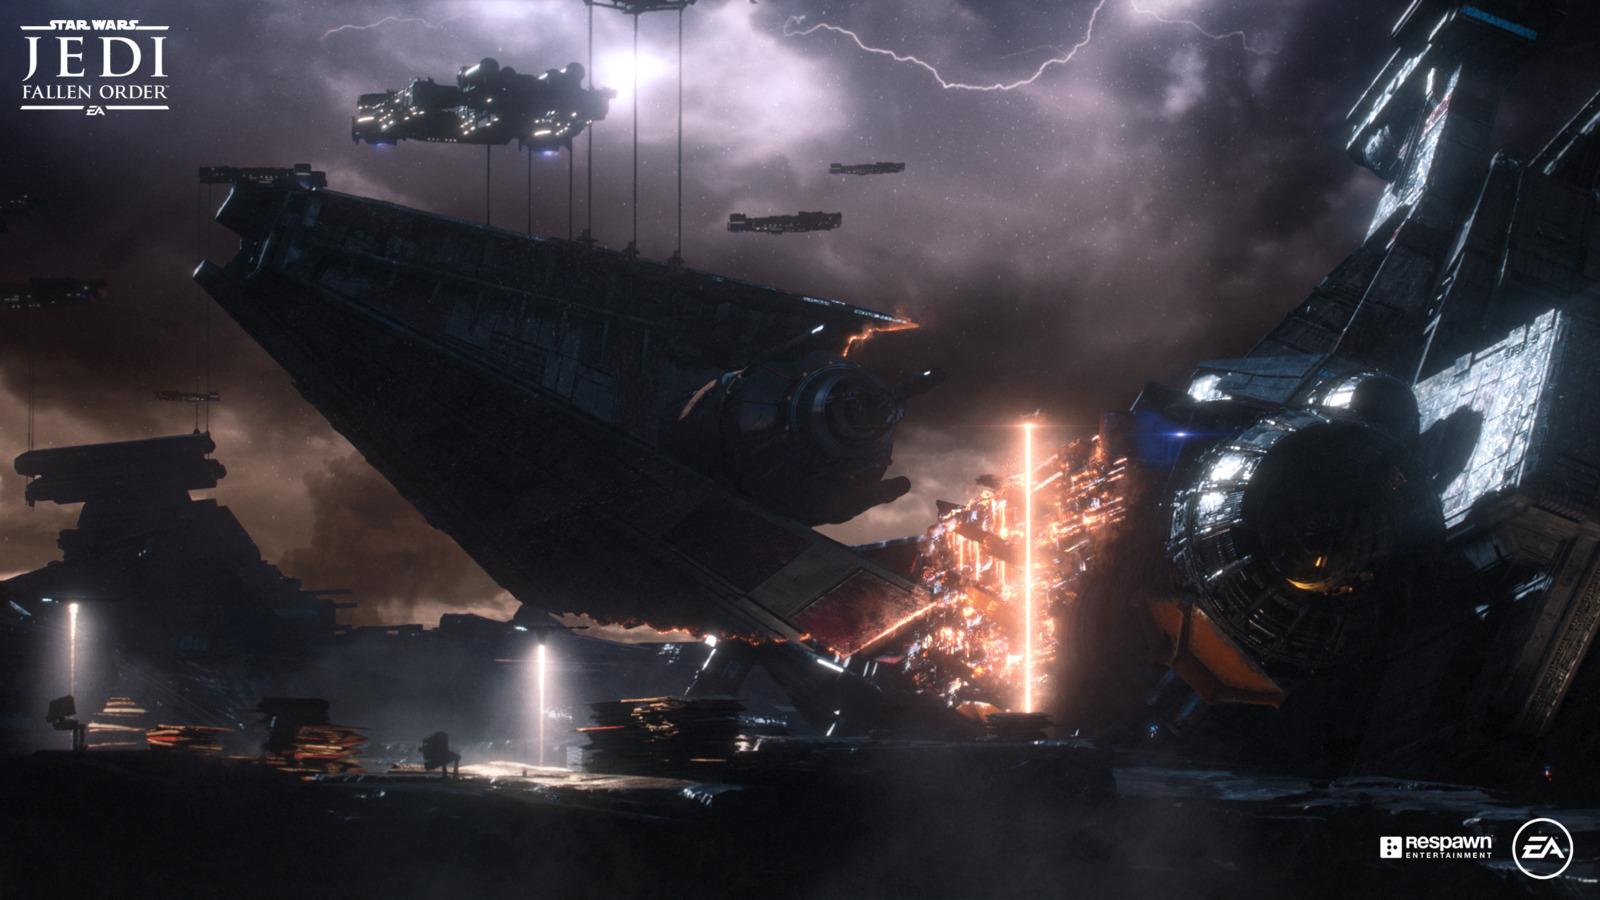 Star Wars Jedi: Fallen Order (code in box) for PC image